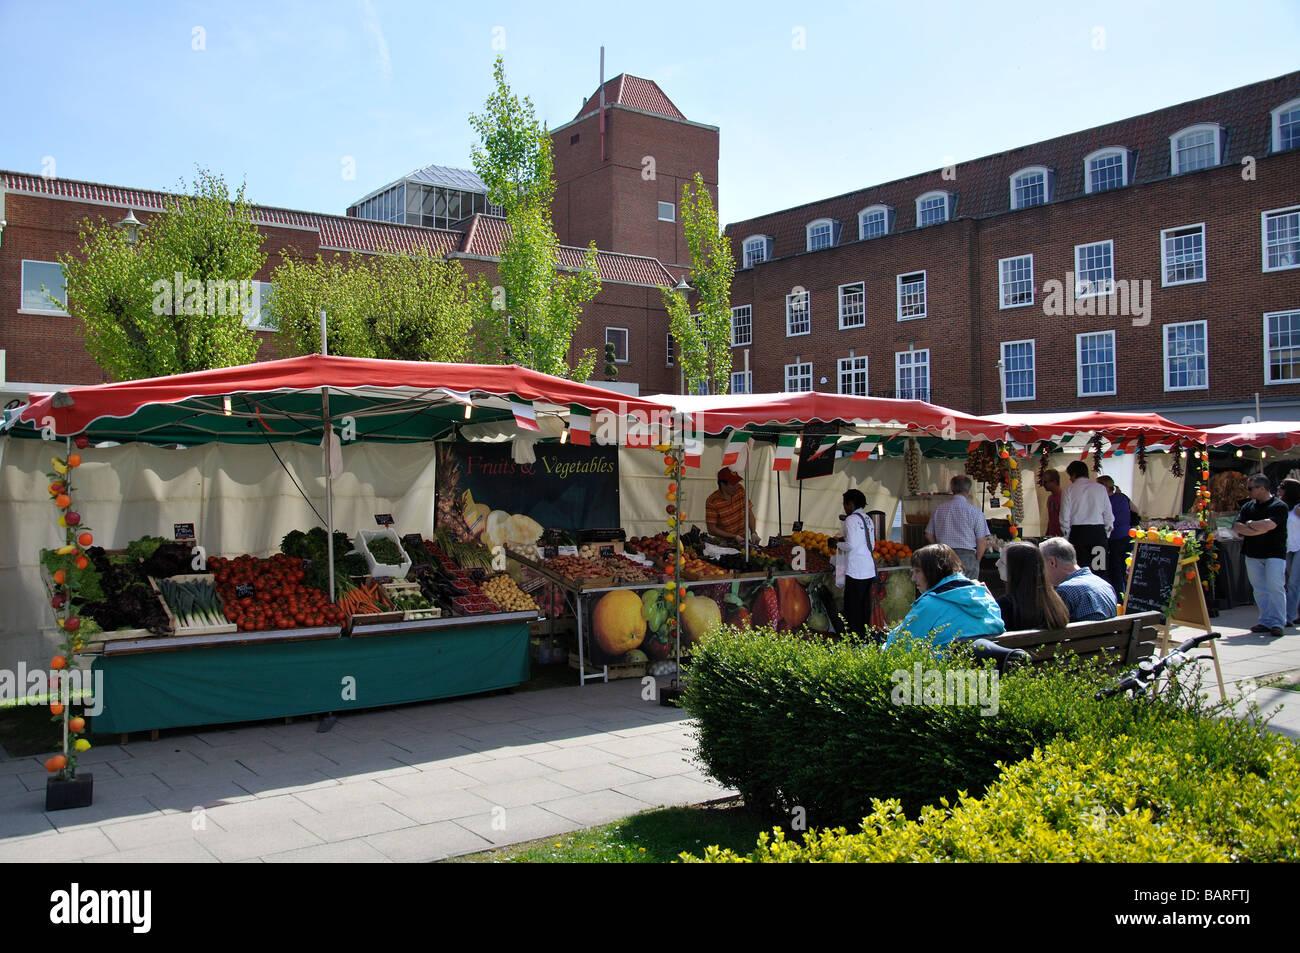 Welwyn Garden City Saturday Market Welwyn Garden City Centre Stock Photo 23874274 Alamy